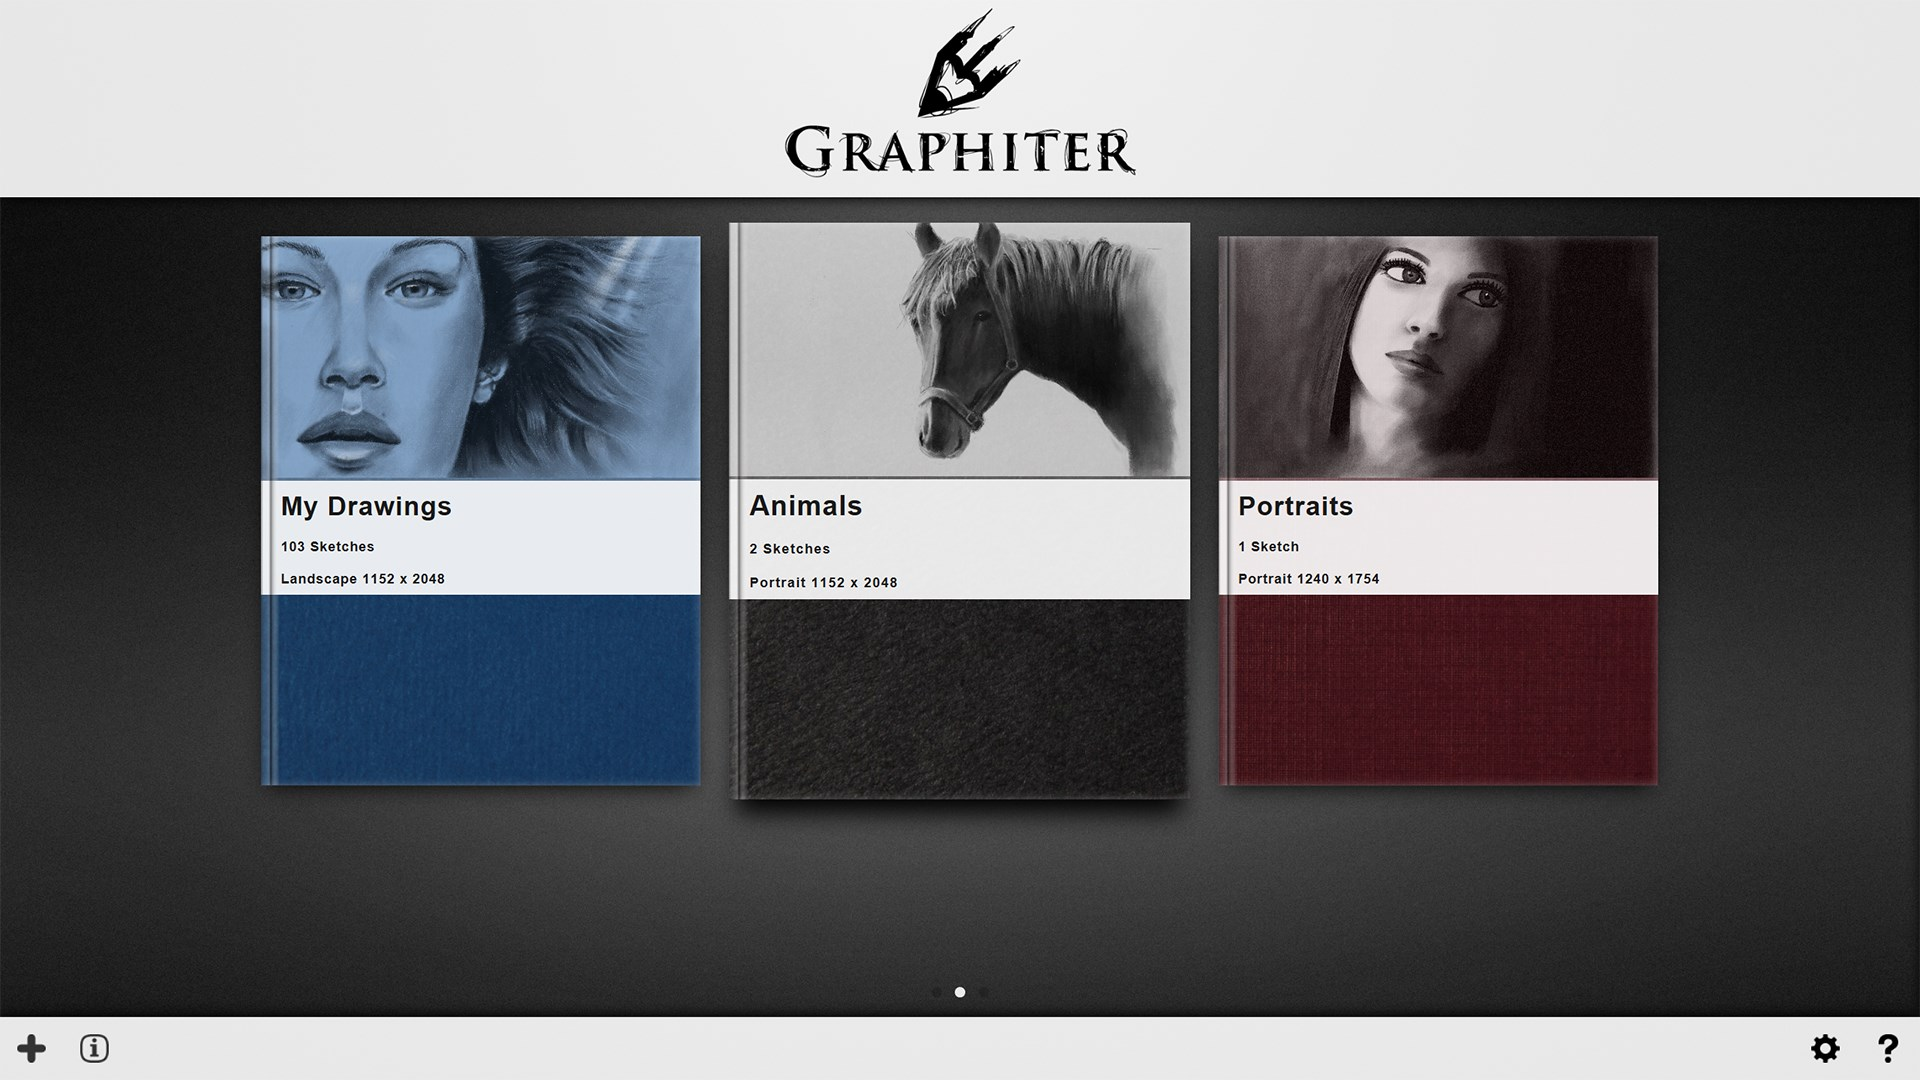 Graphiter